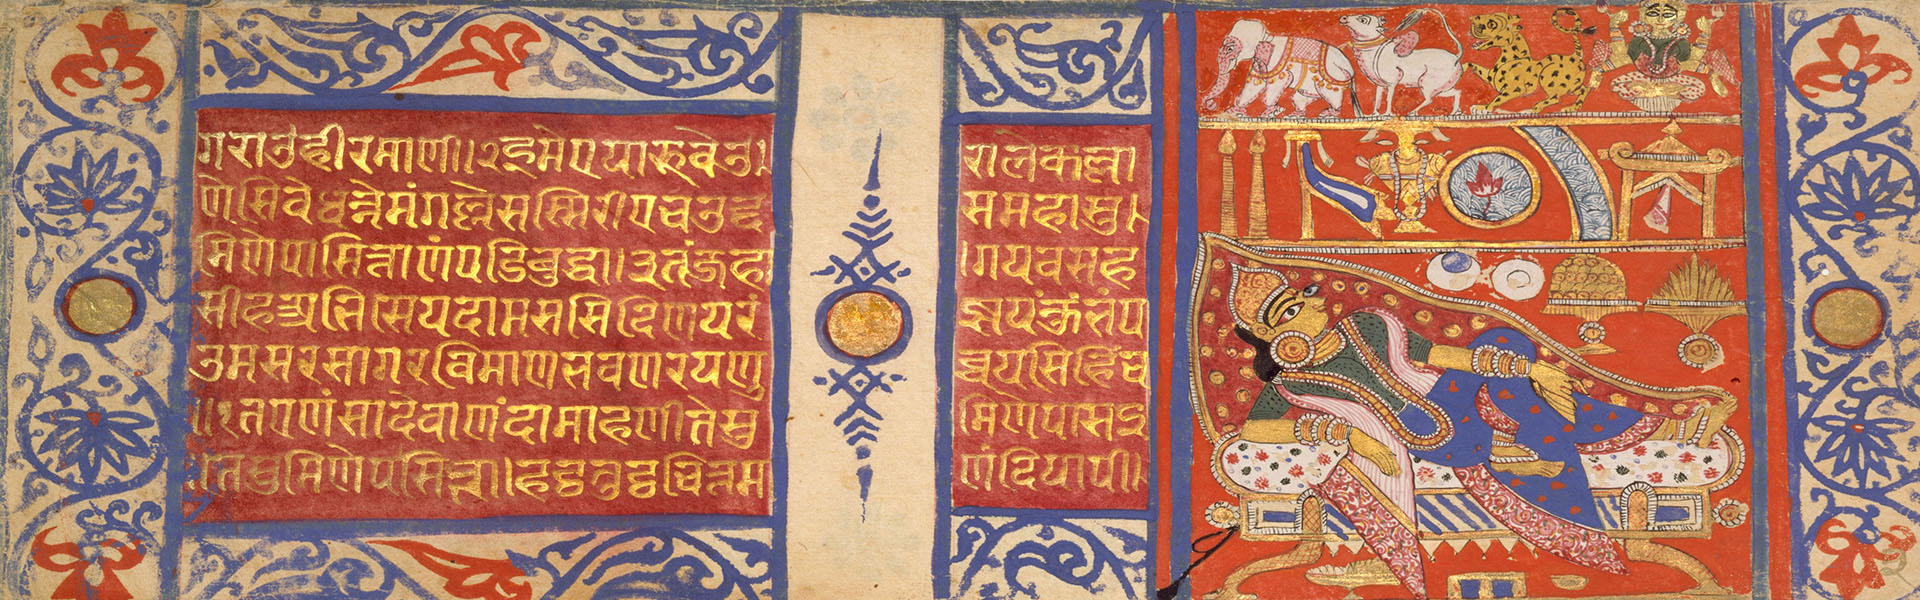 banner-images